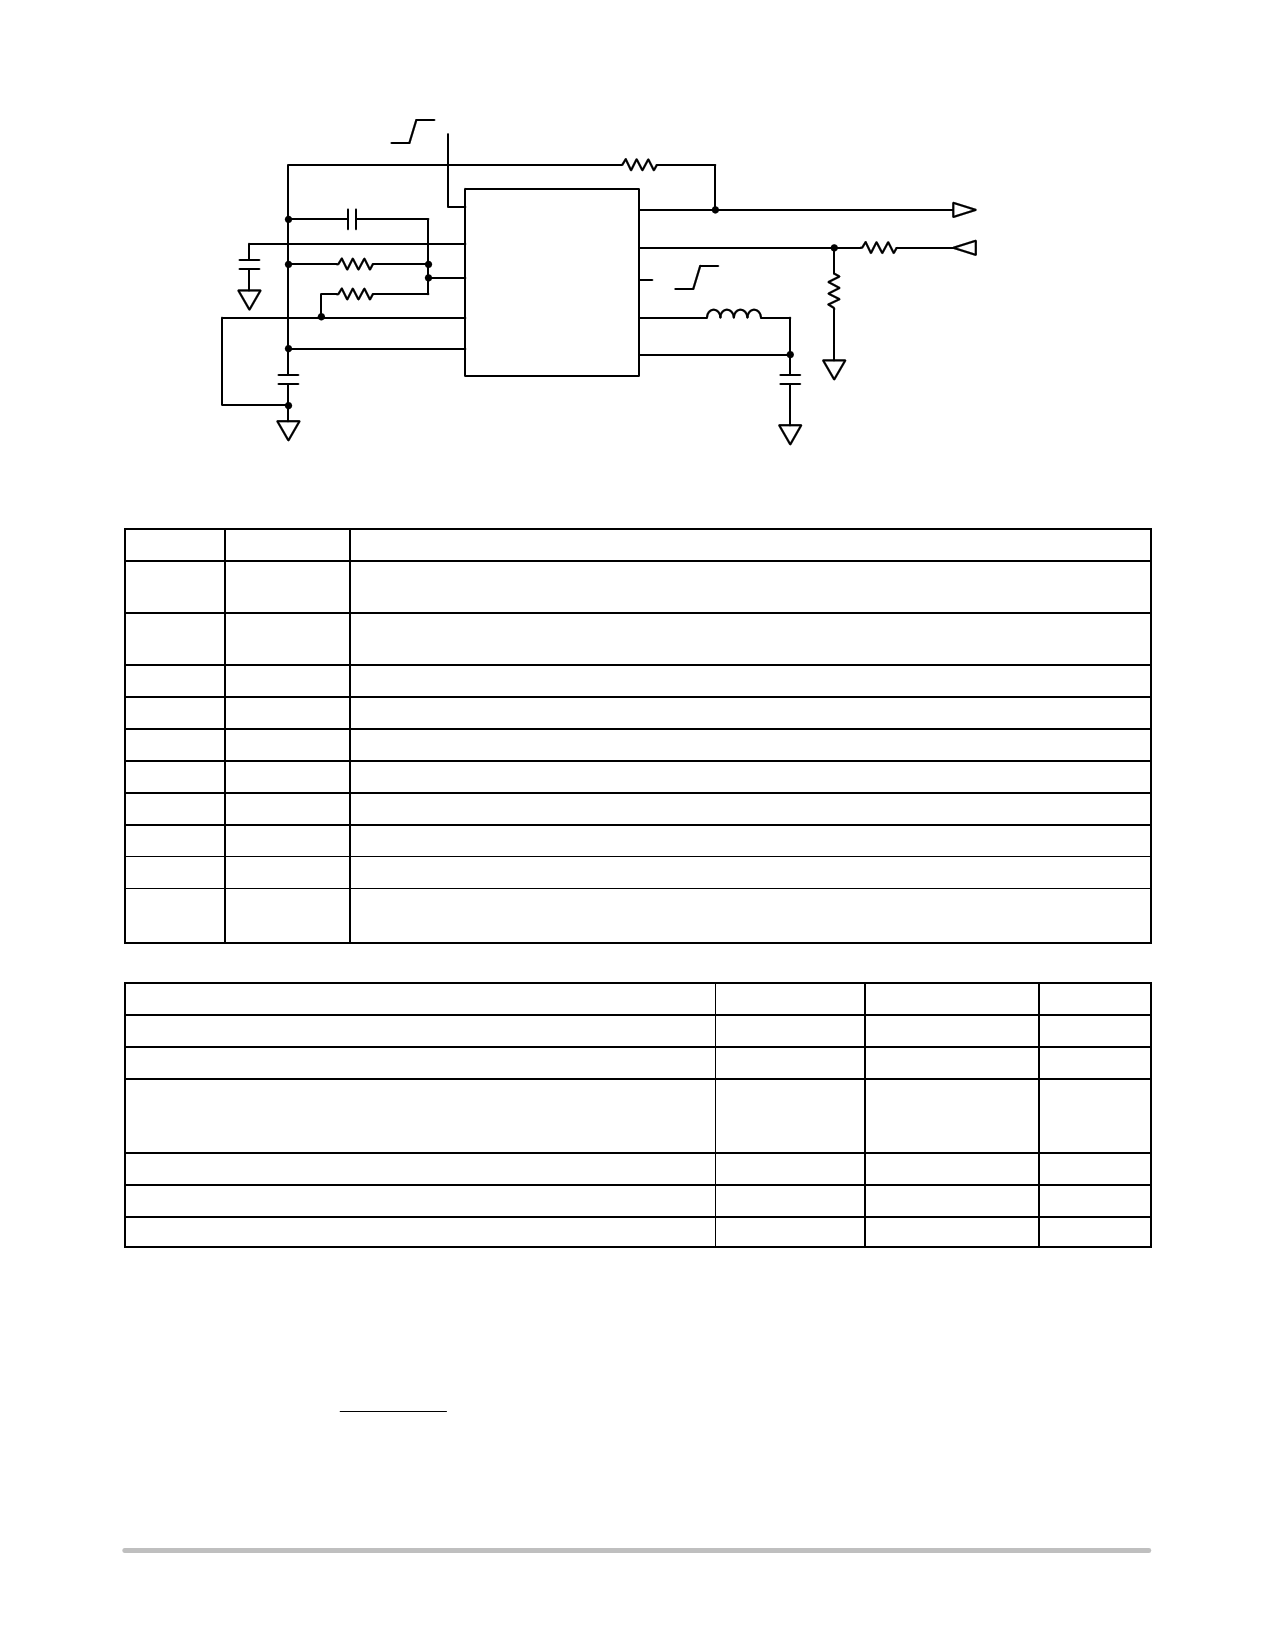 SCV1423 pdf, equivalent, schematic